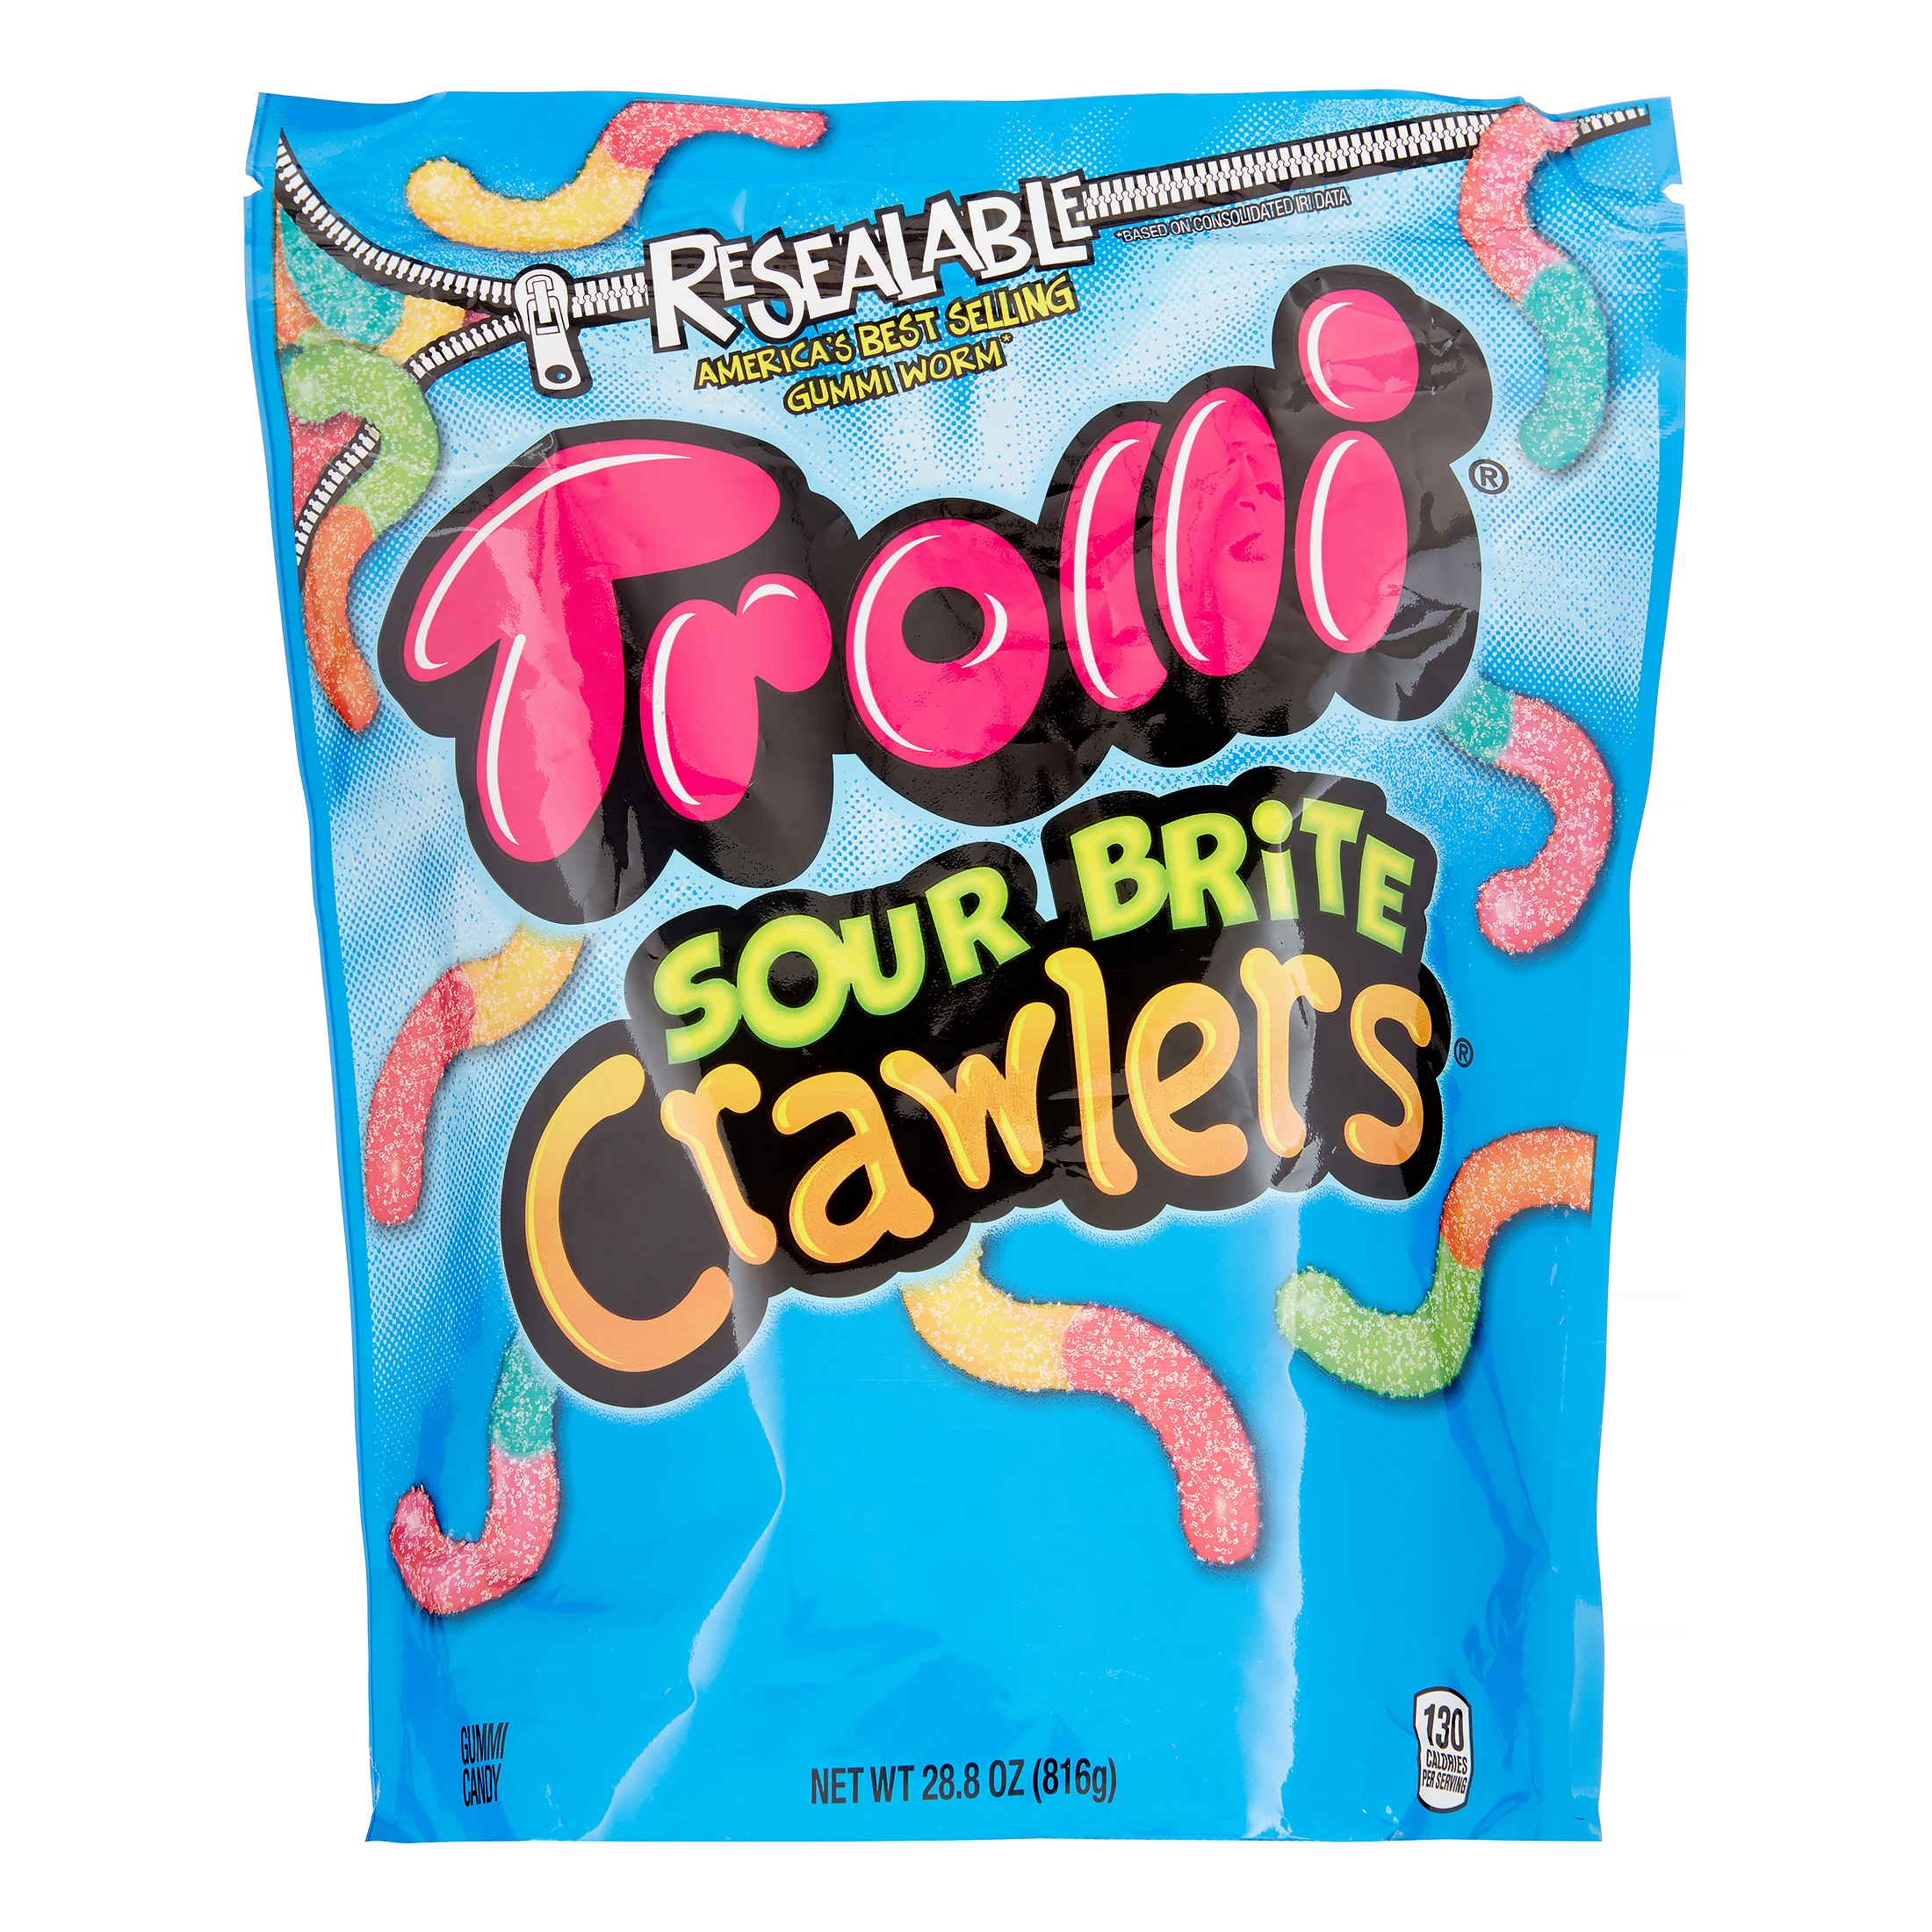 Trolli Sour Brite Crawlers Gummi Candy - 28.8oz